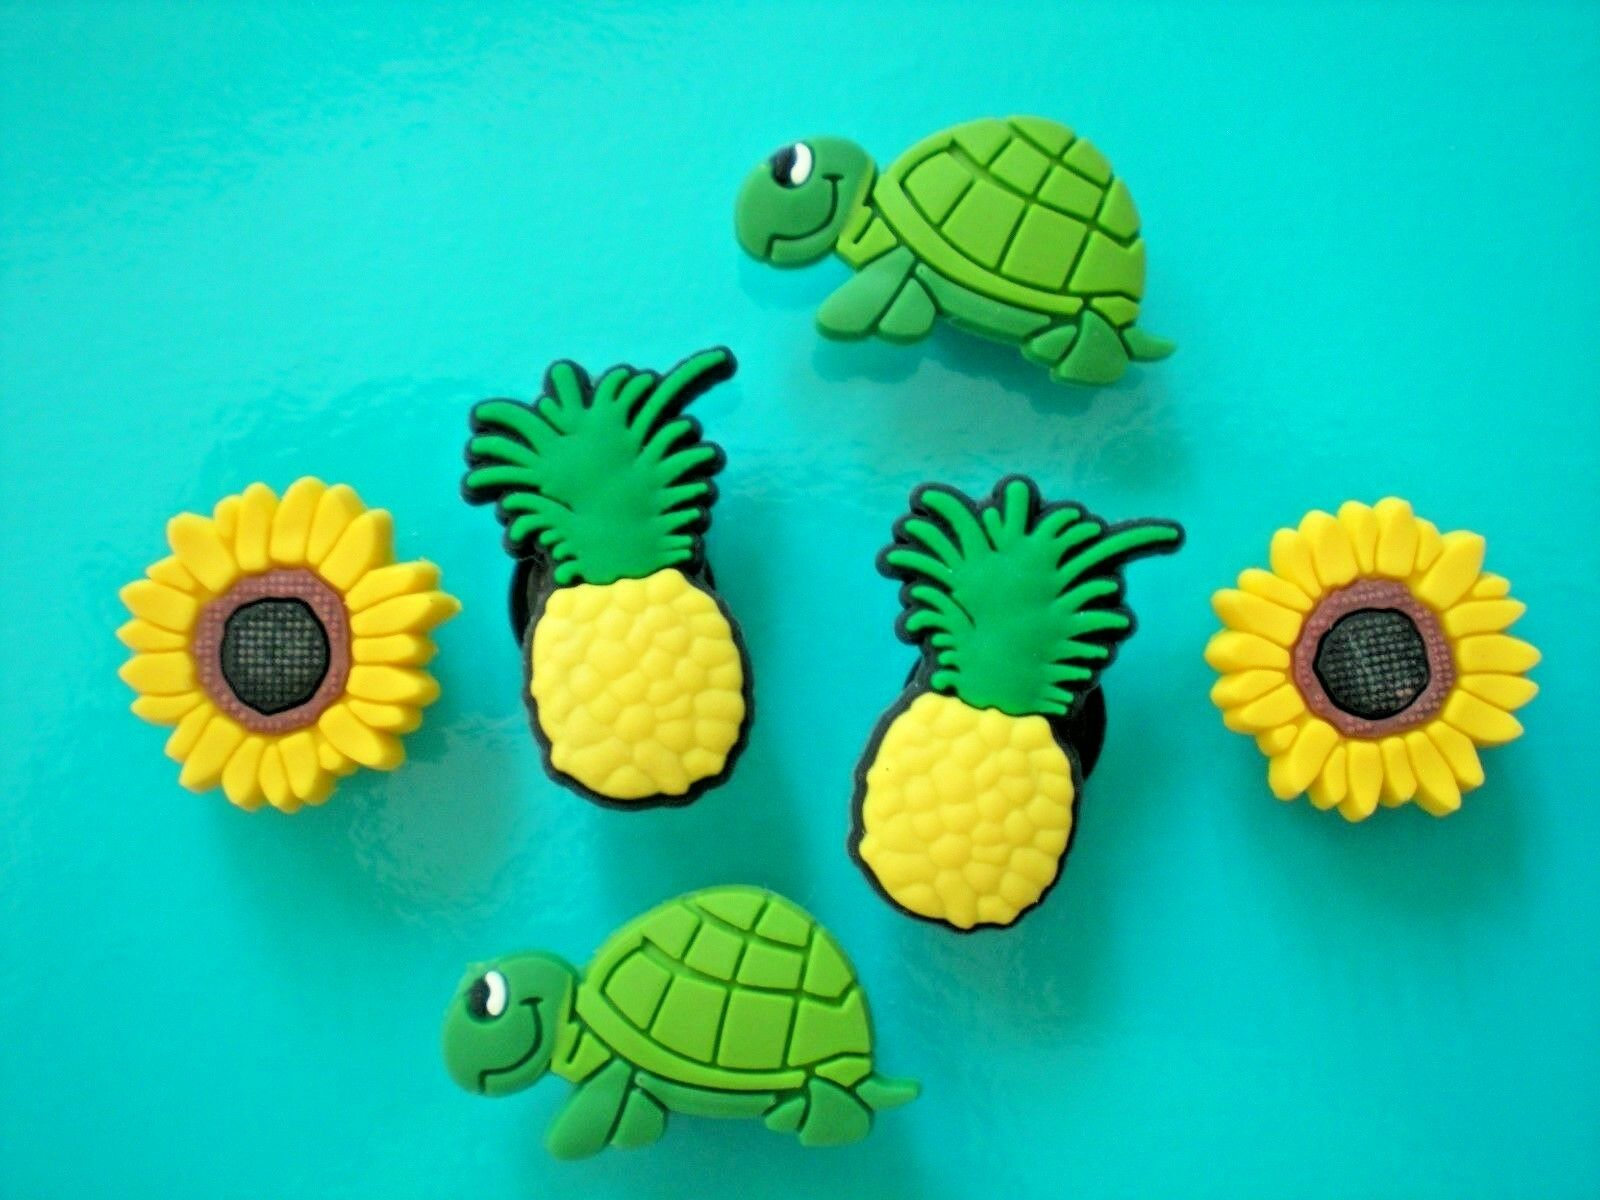 Clog Shoe Charm Plug Button Fitbit Wristband Belt Jibbit Accessories 2 Pineapple